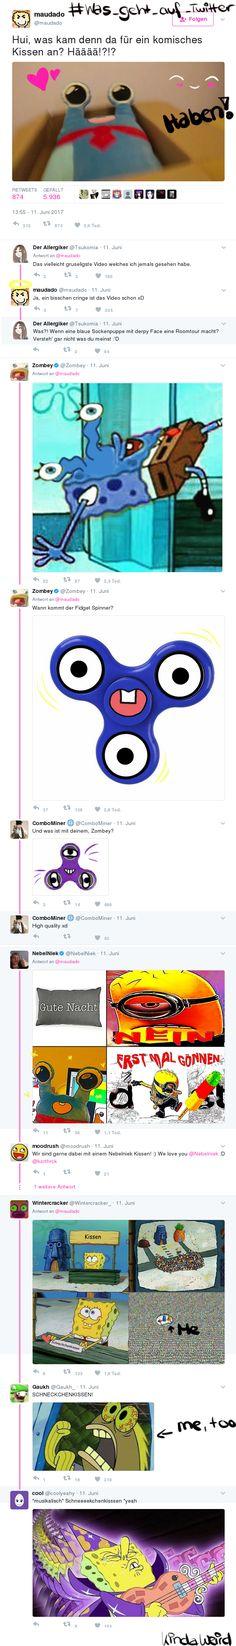 Twitter//maudado//Schneckchen//Zombey//Wintercracker//Funny//Merch?//Memes//Spongebob//Creepy//Cute//Awesome//Fidget Spinner//Zomdado//MONGO-CLAN//MONGO//Funny//KindaWeird//Eigene Pins